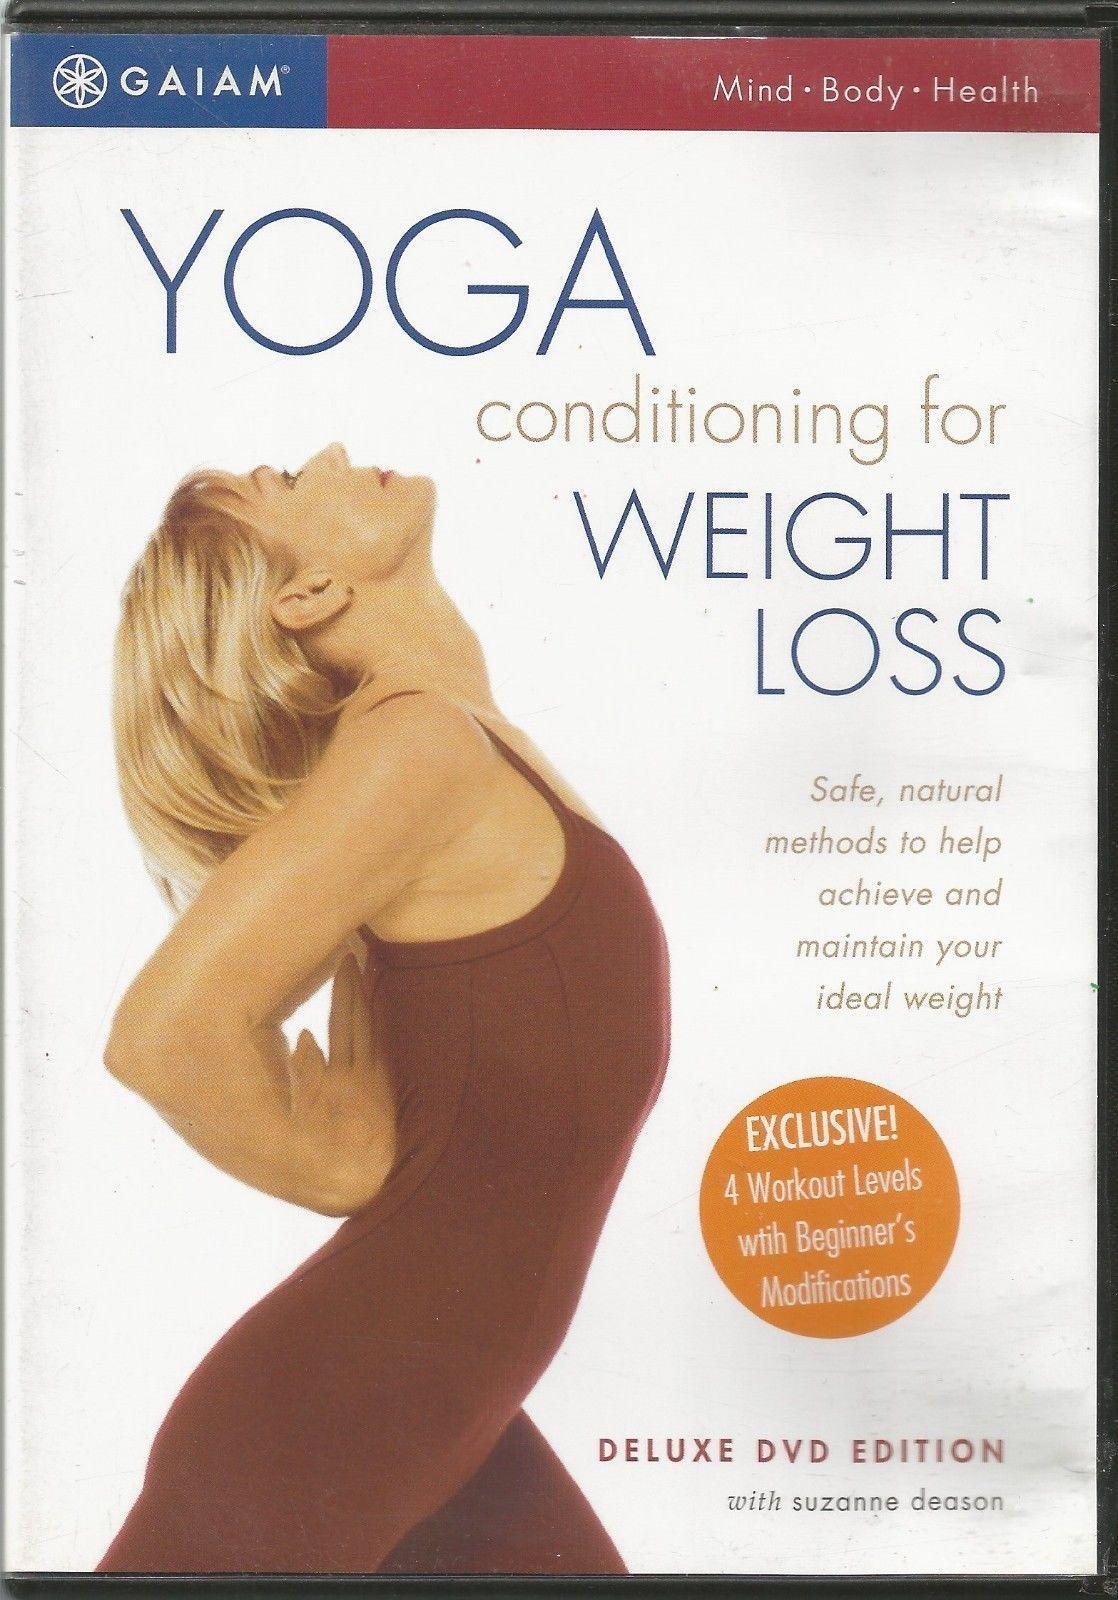 Weight loss one week postpartum photo 9